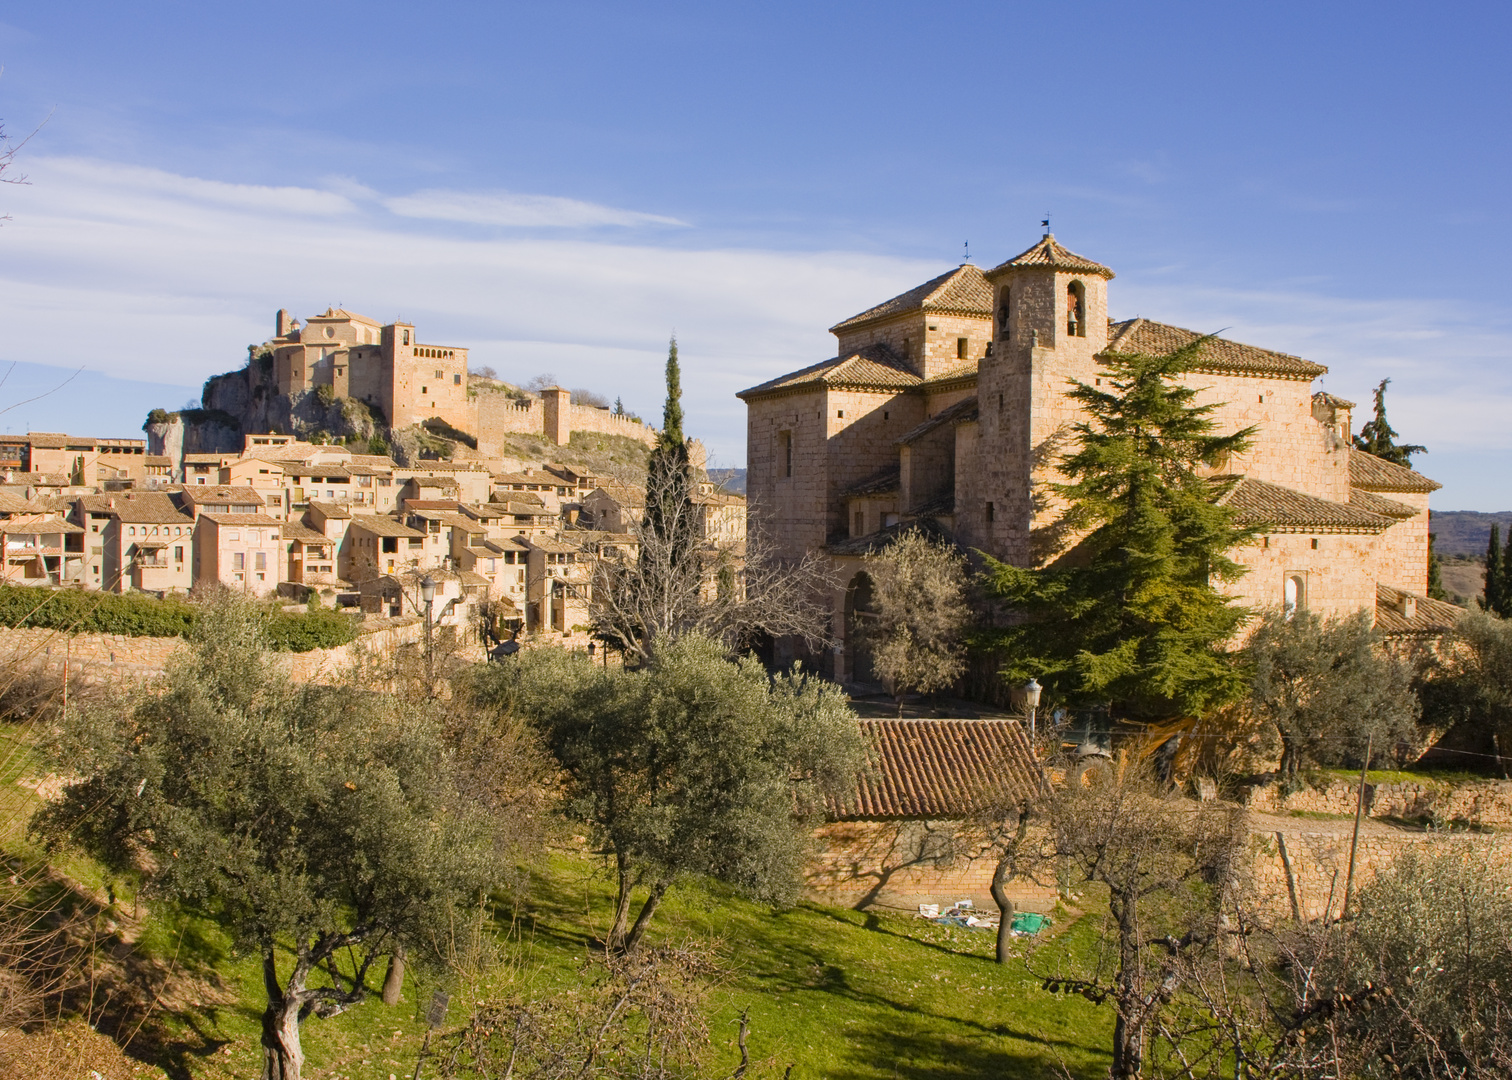 Alquezar (Huesca) 2